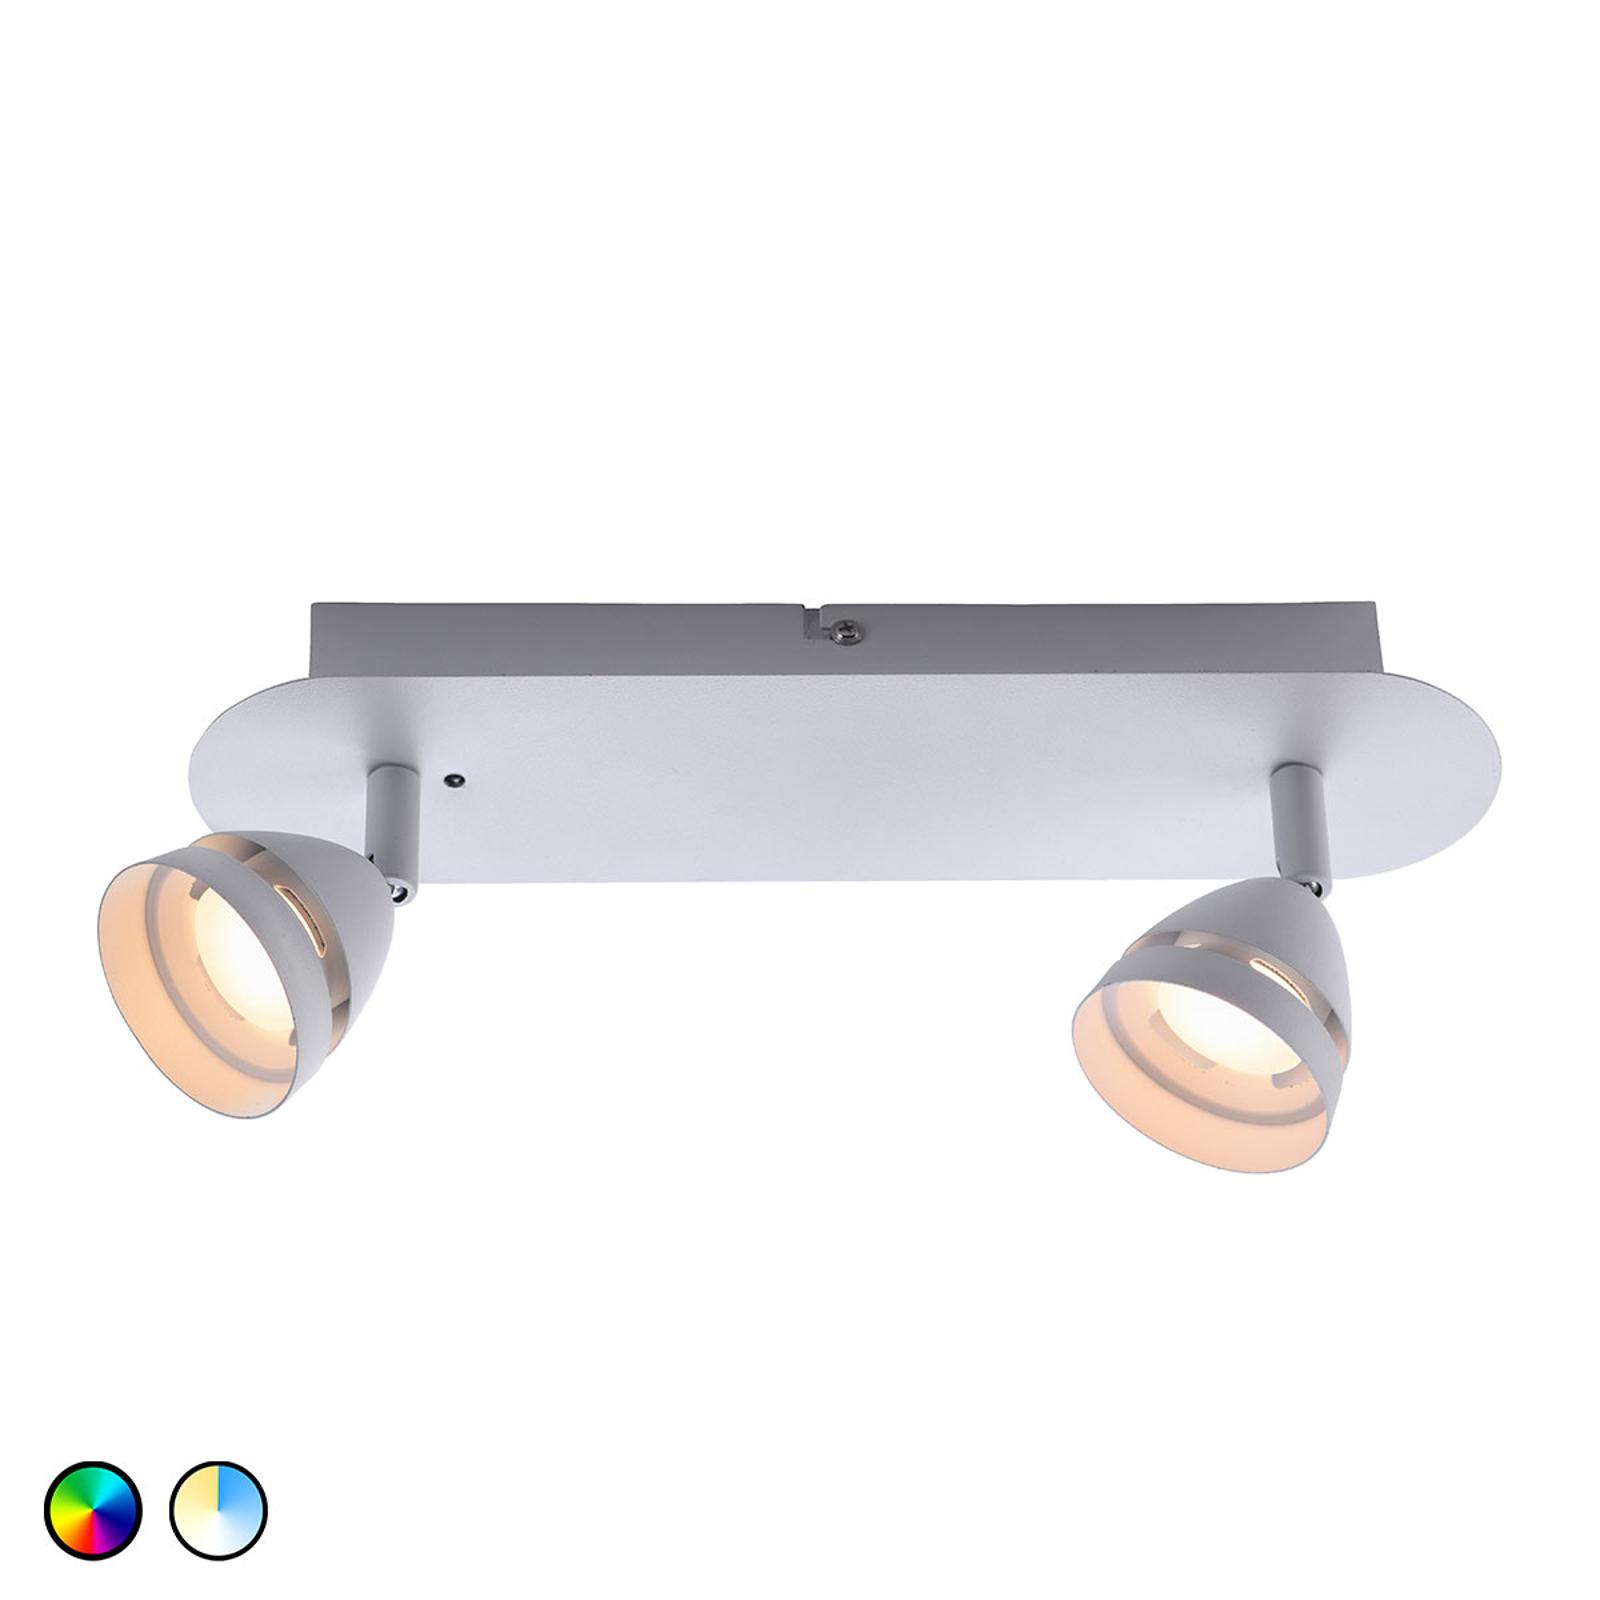 Trio WiZ Gemini lampa sufitowa LED 2-pkt. biala